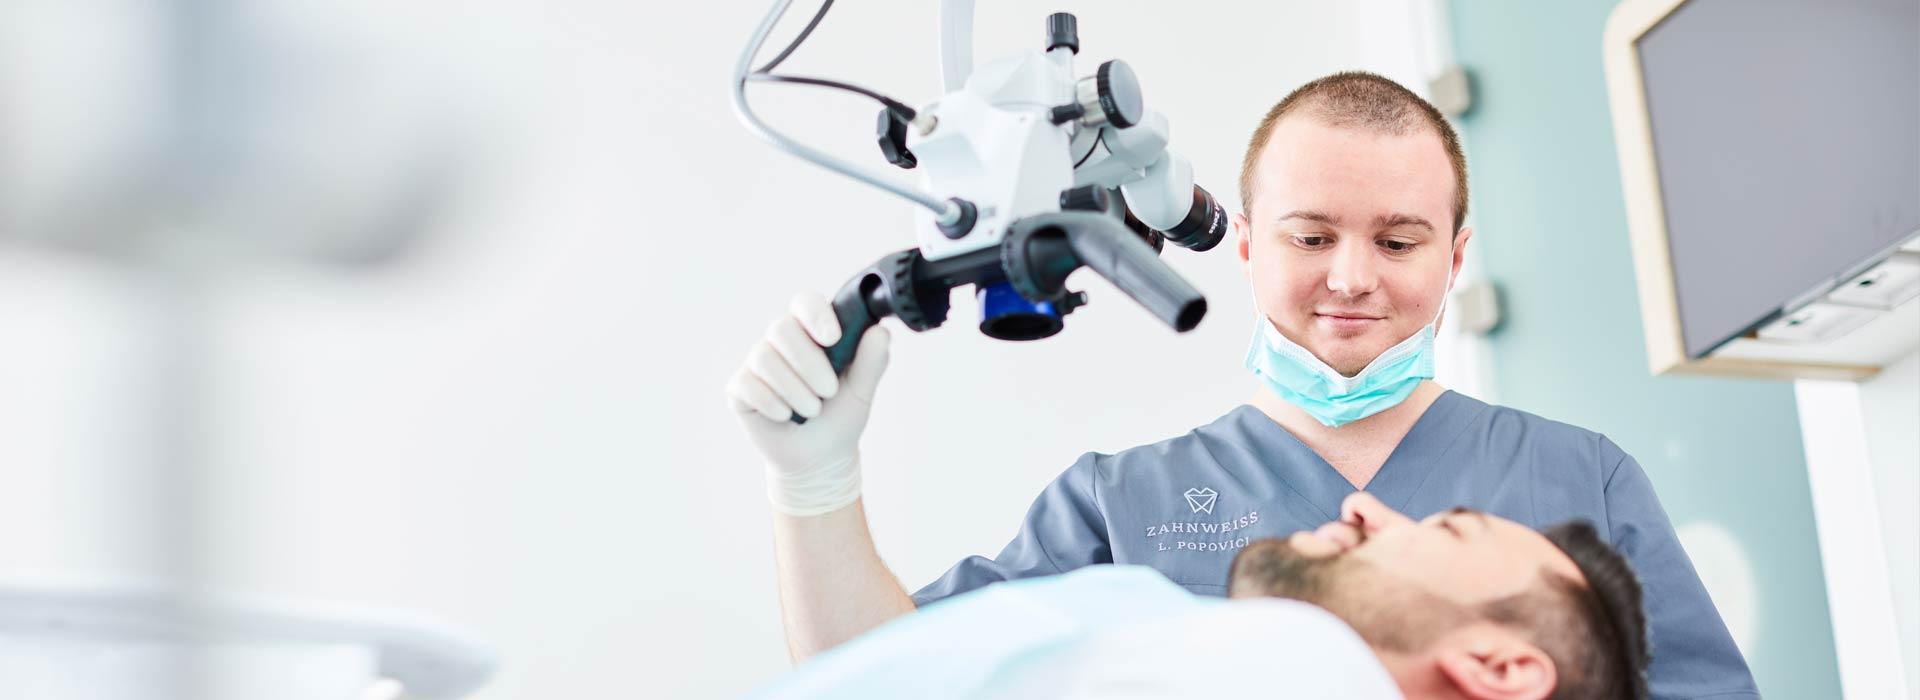 ZAHNWEISS – Praxis für moderne Zahnmedizin - Endodontie 1